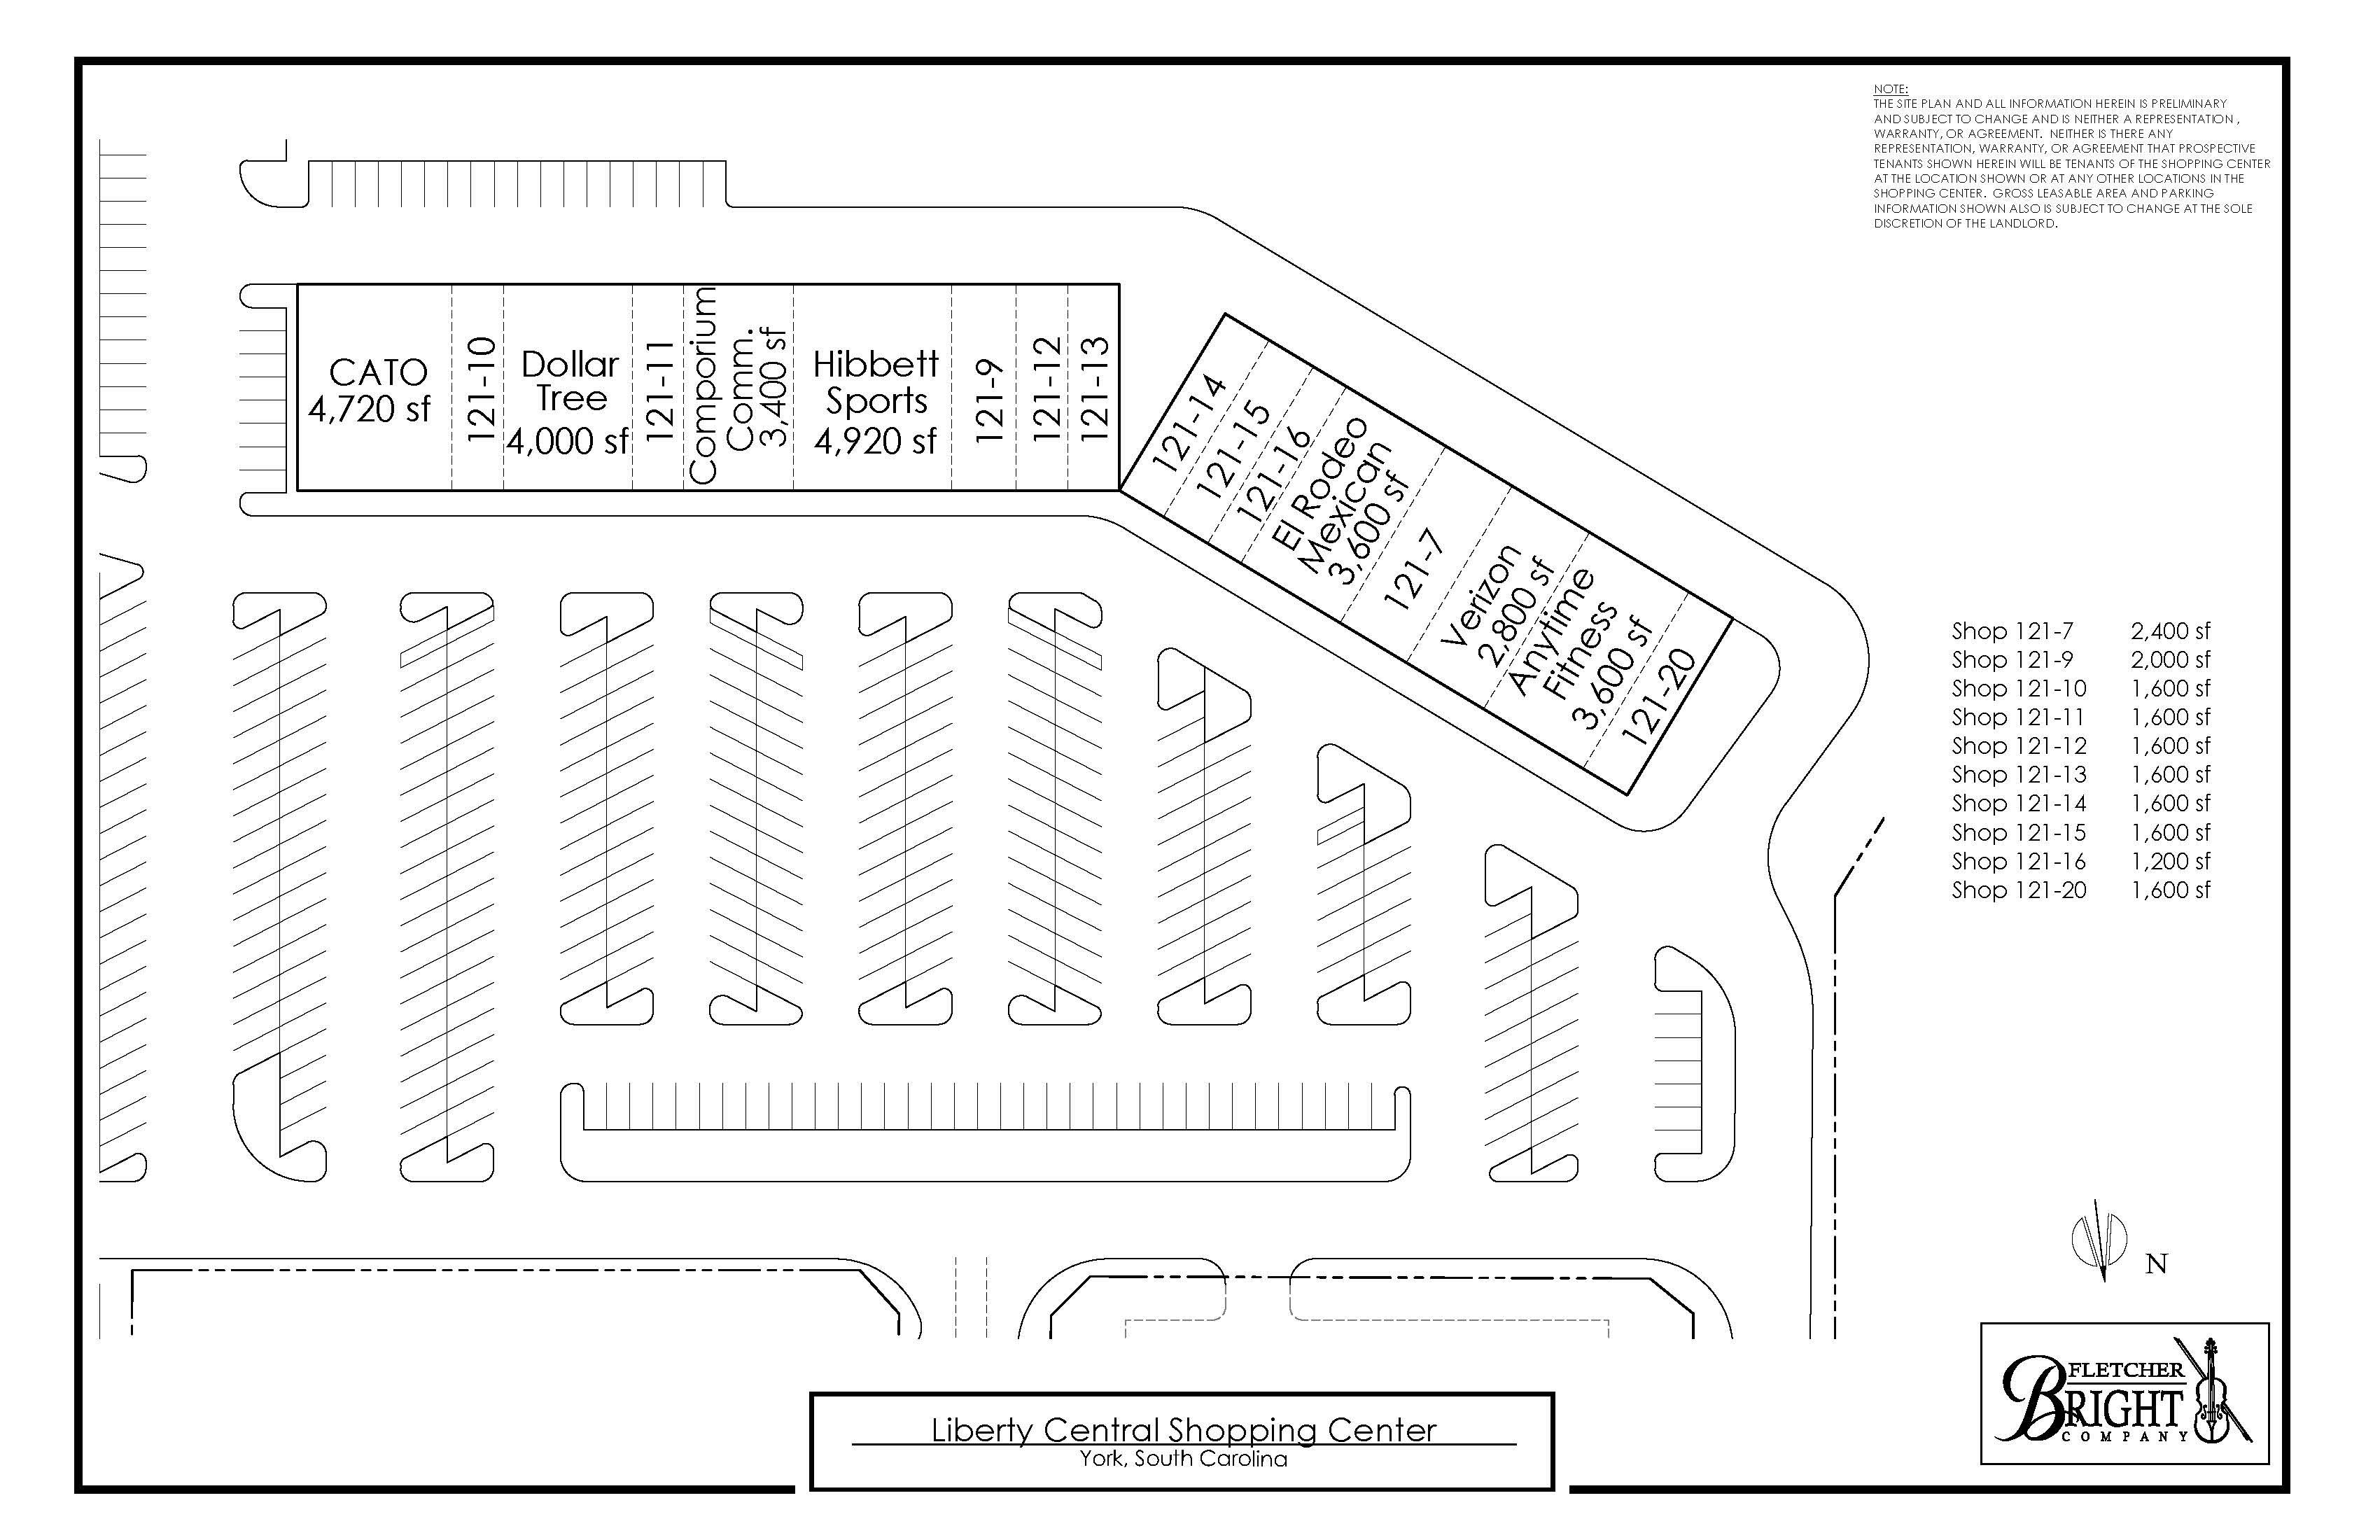 liberty central fletcher bright. Black Bedroom Furniture Sets. Home Design Ideas